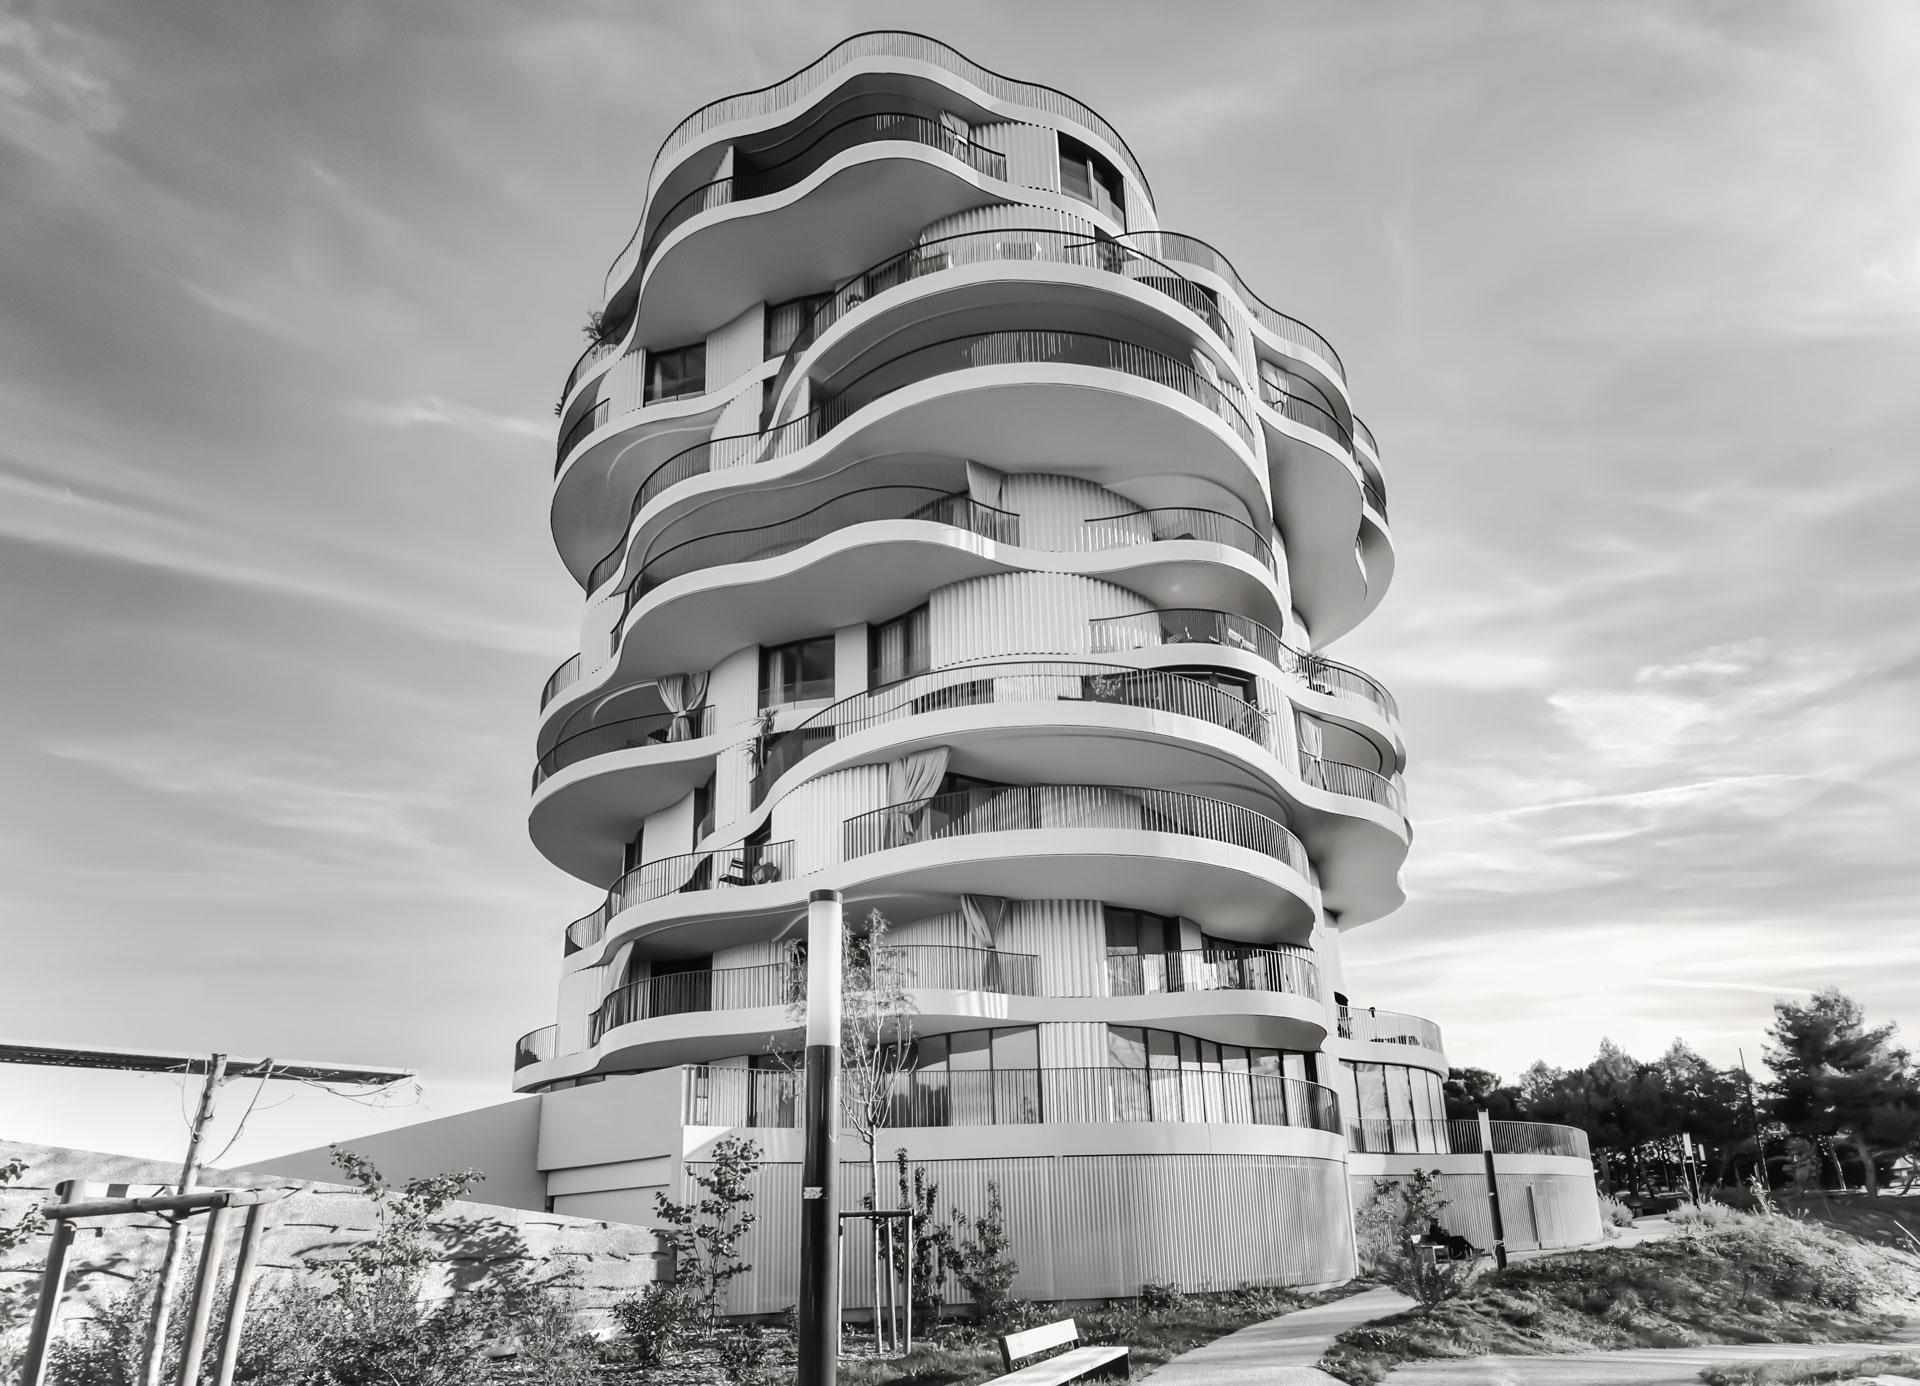 photographe pro architecture montpellier